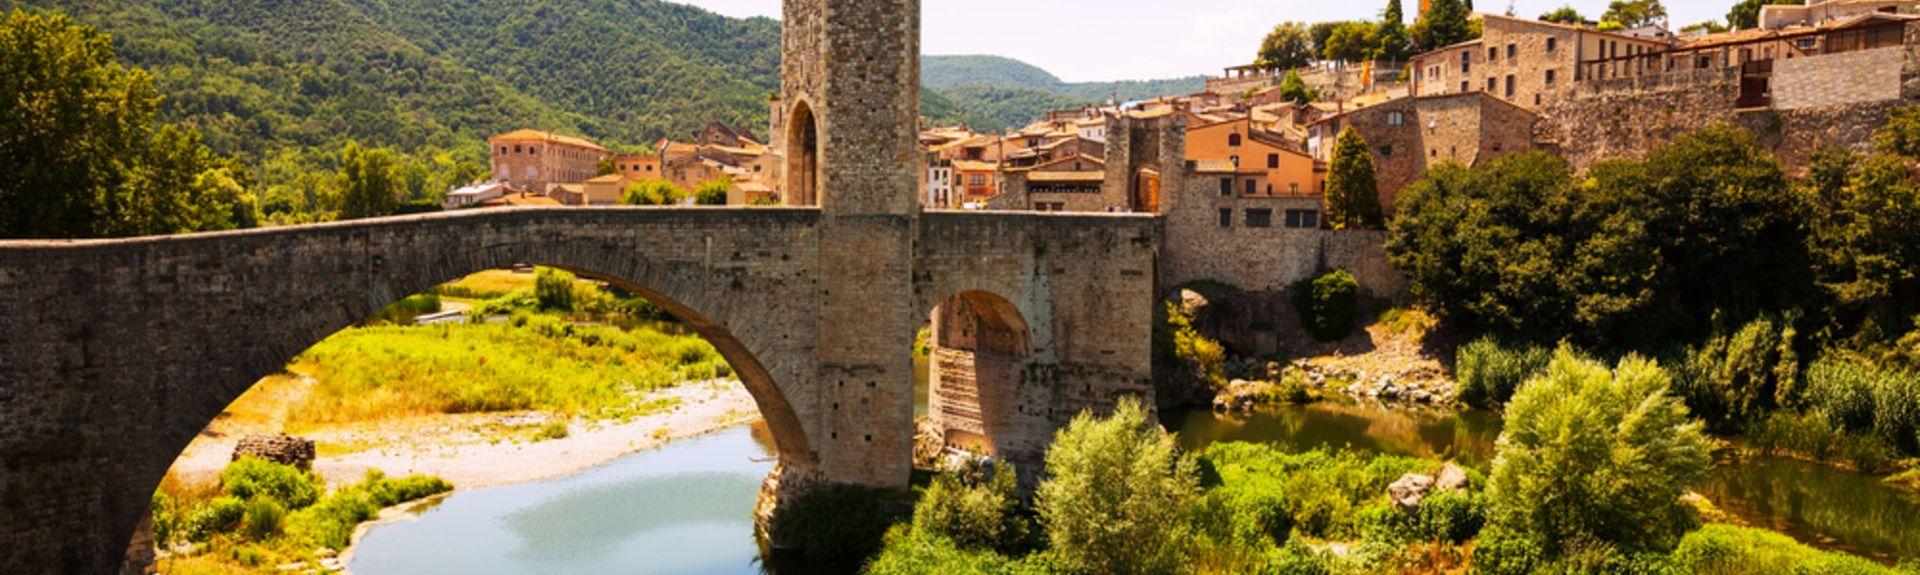 Salou, Catalogne, Espagne